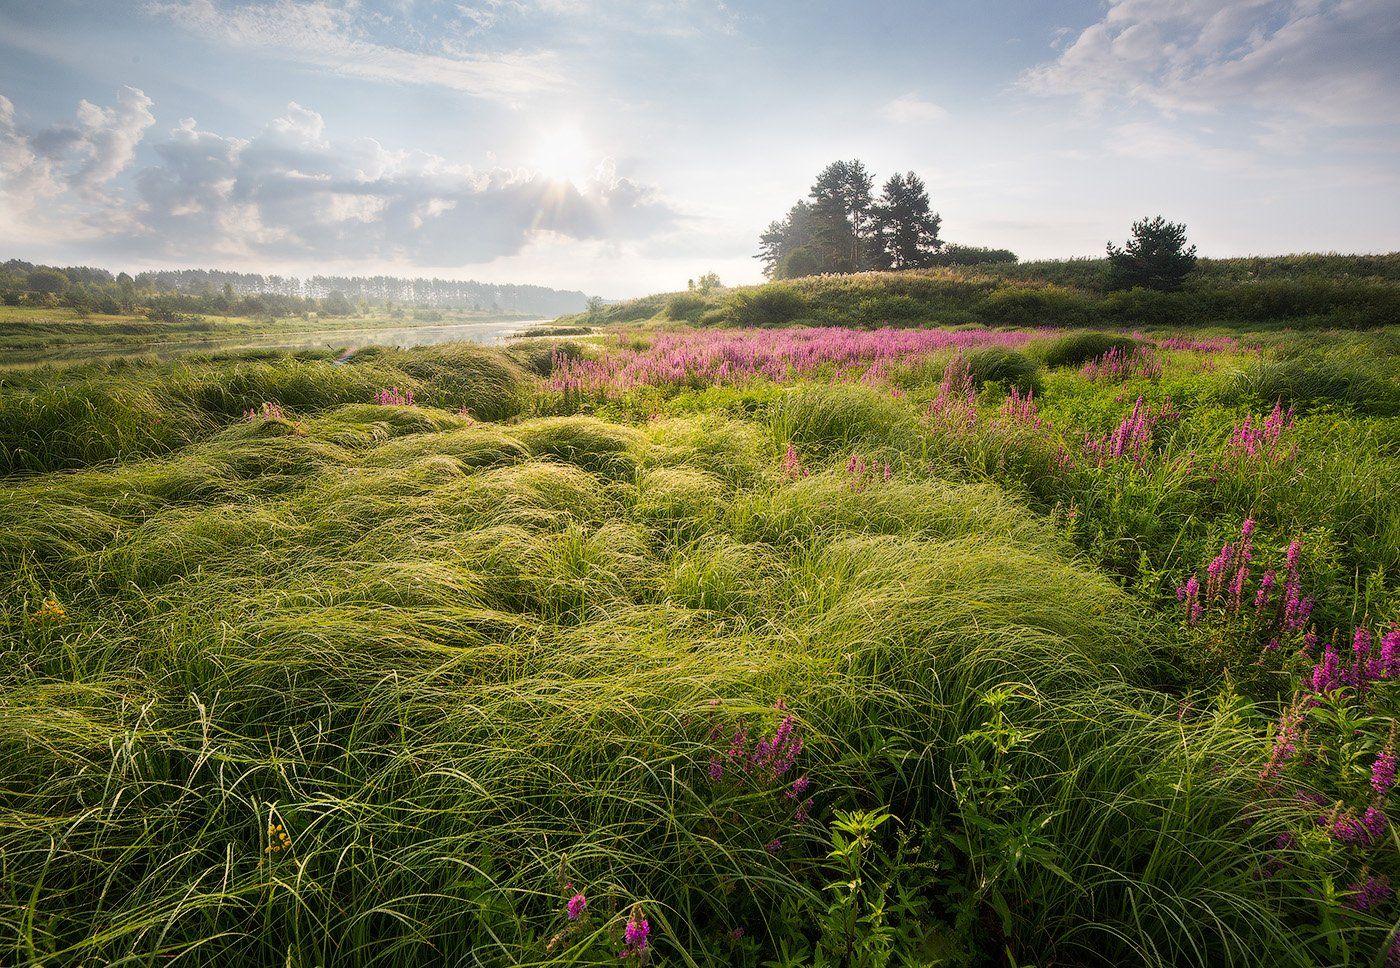 landsacpe, morning, grass, sky, утро, пейзаж, Голубев Дмитрий